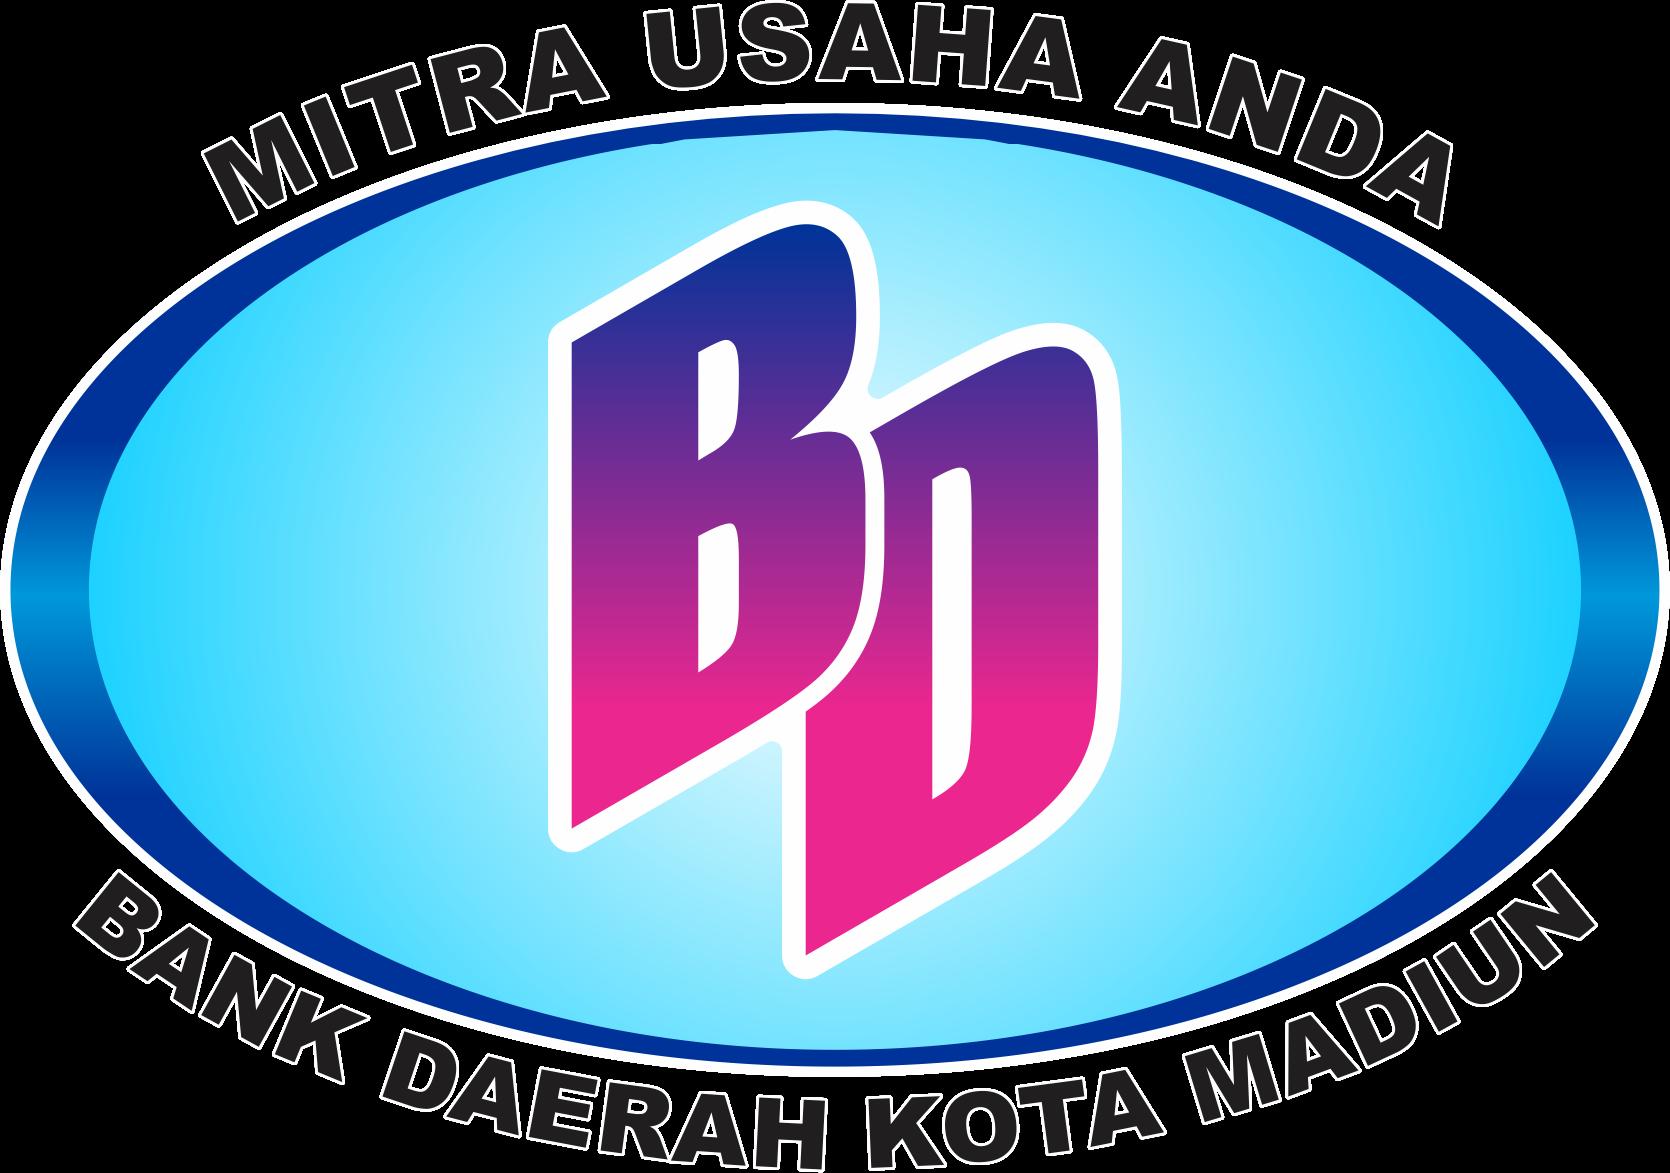 PD. BPR Bank Daerah Kota Madiun